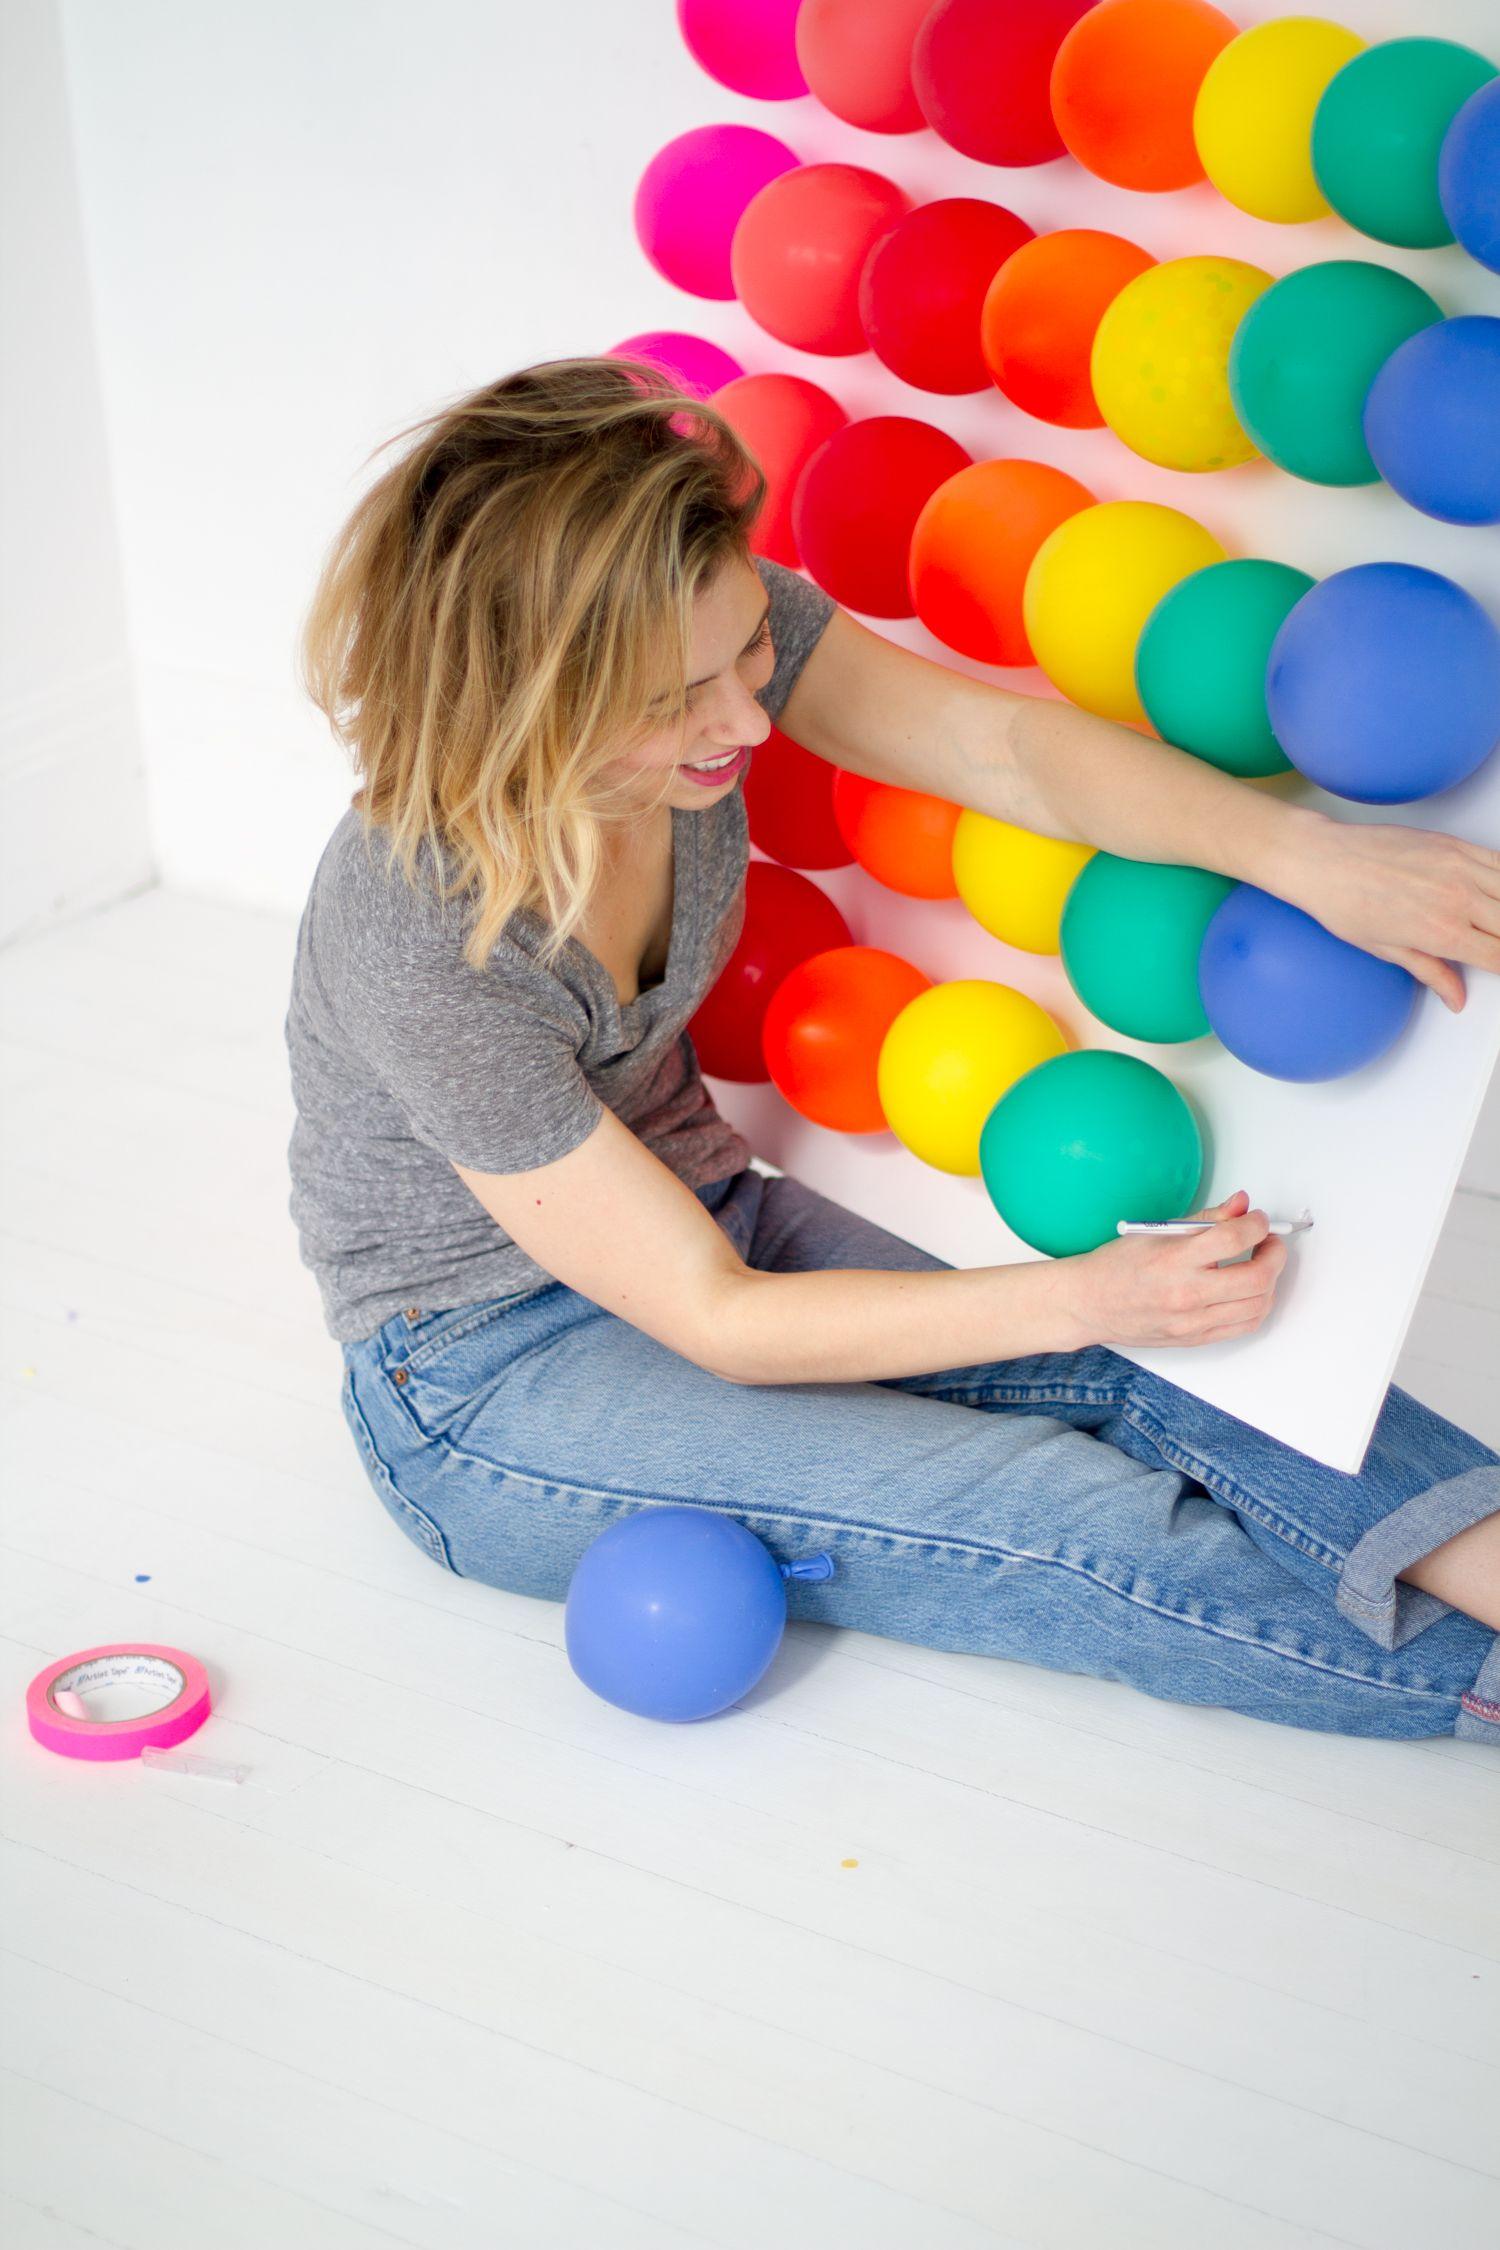 Rainbow Balloon Carnival Game Trolls birthday party